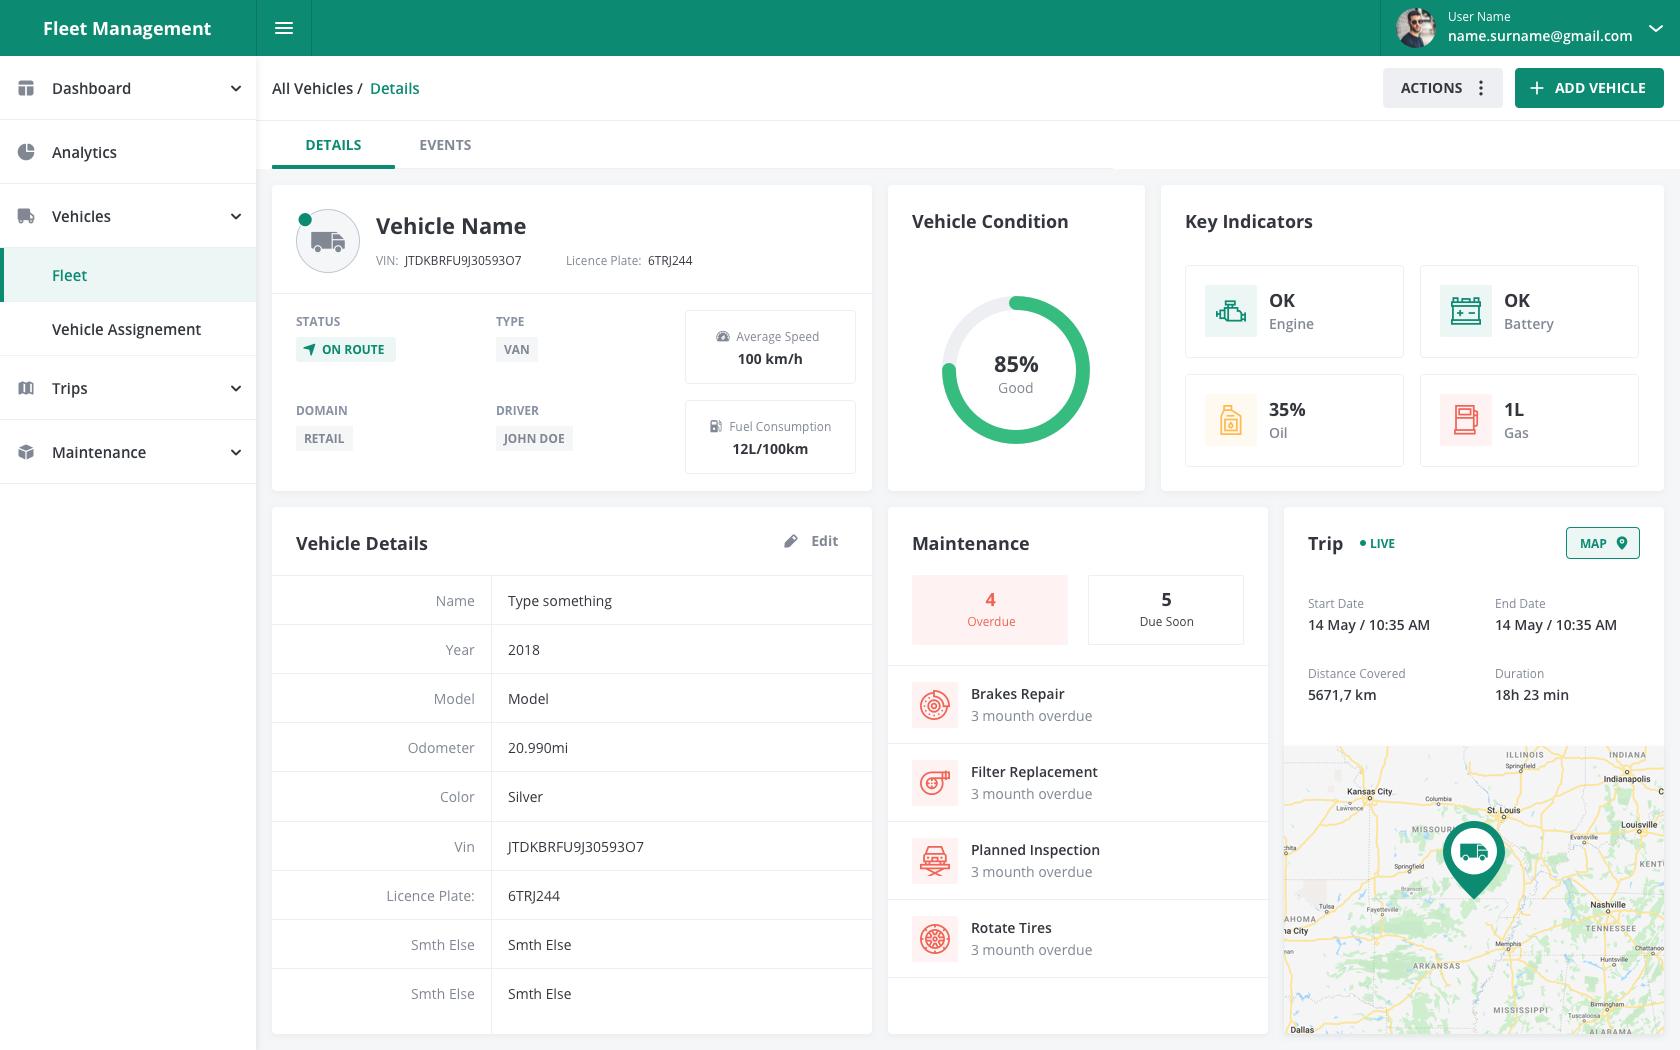 Fleet Management Dashboard Vehicles Details